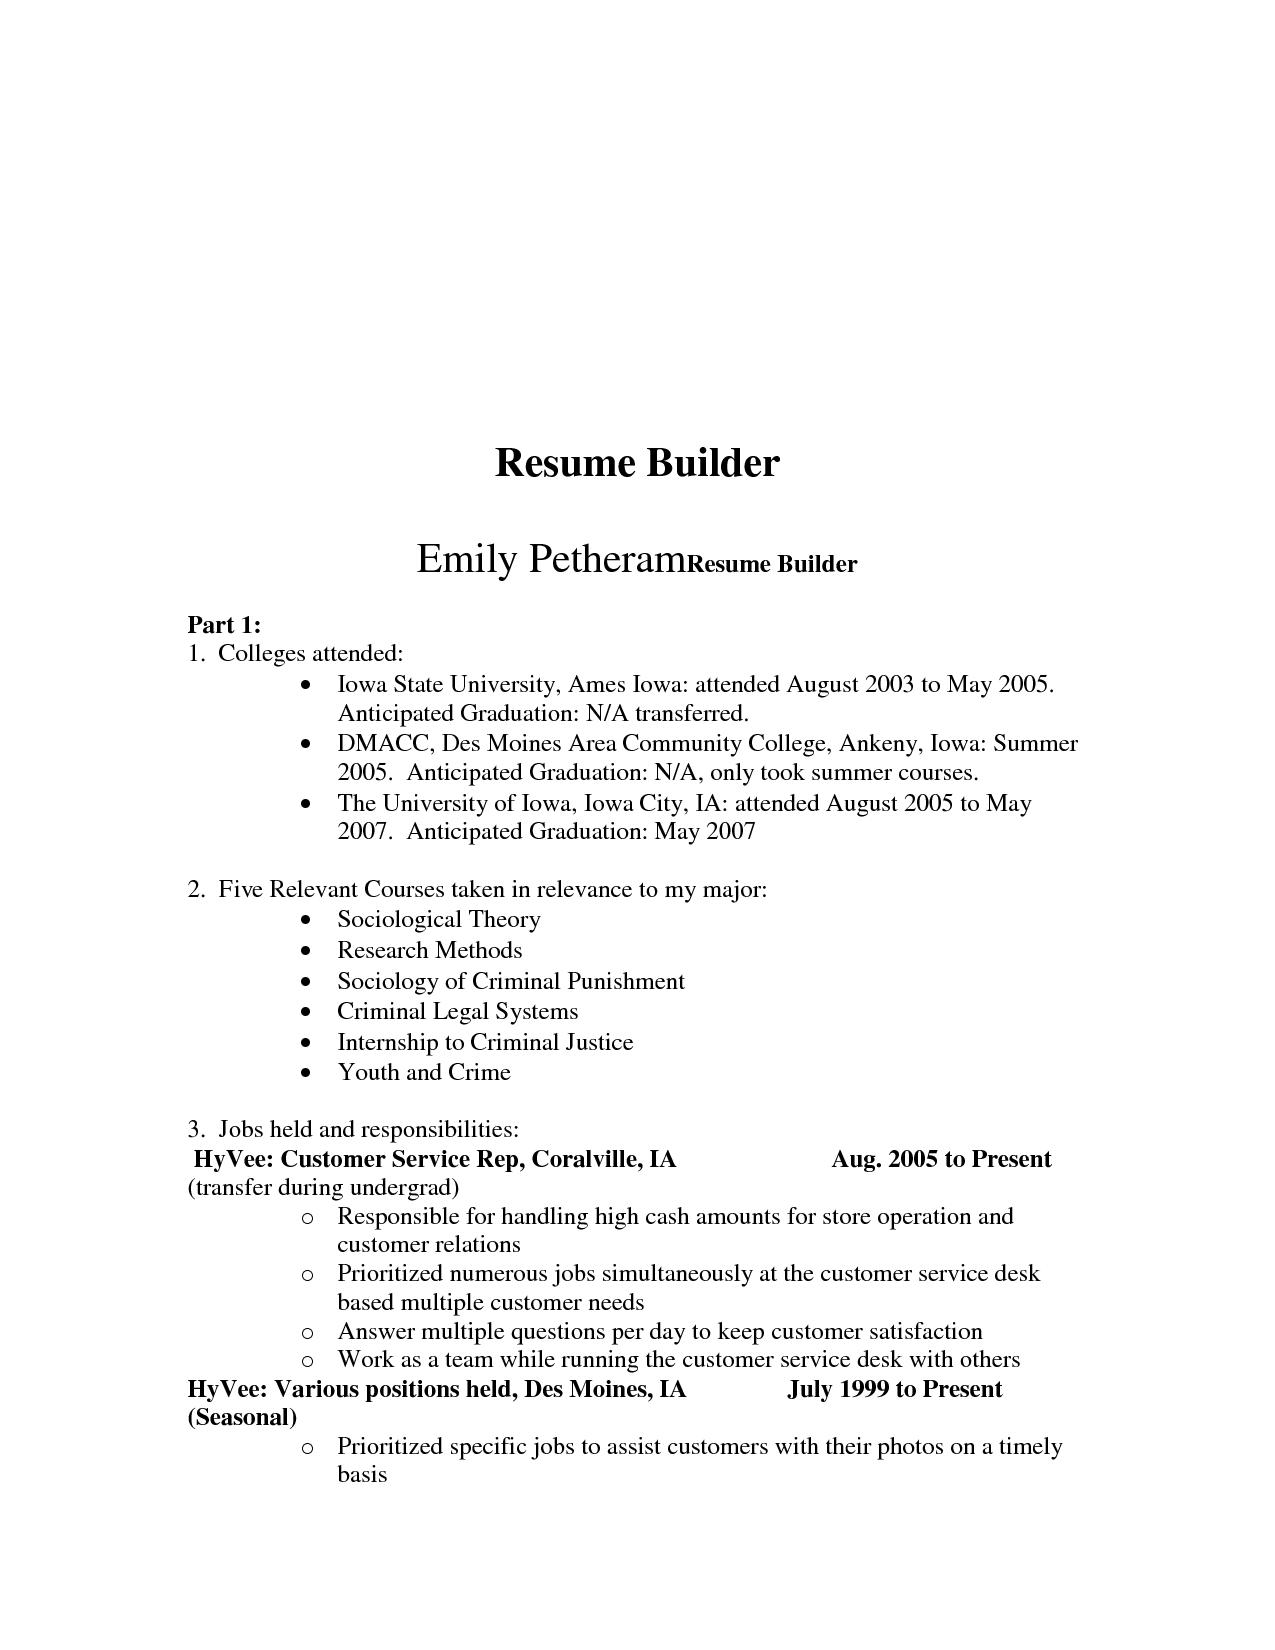 Free College Resume Builder